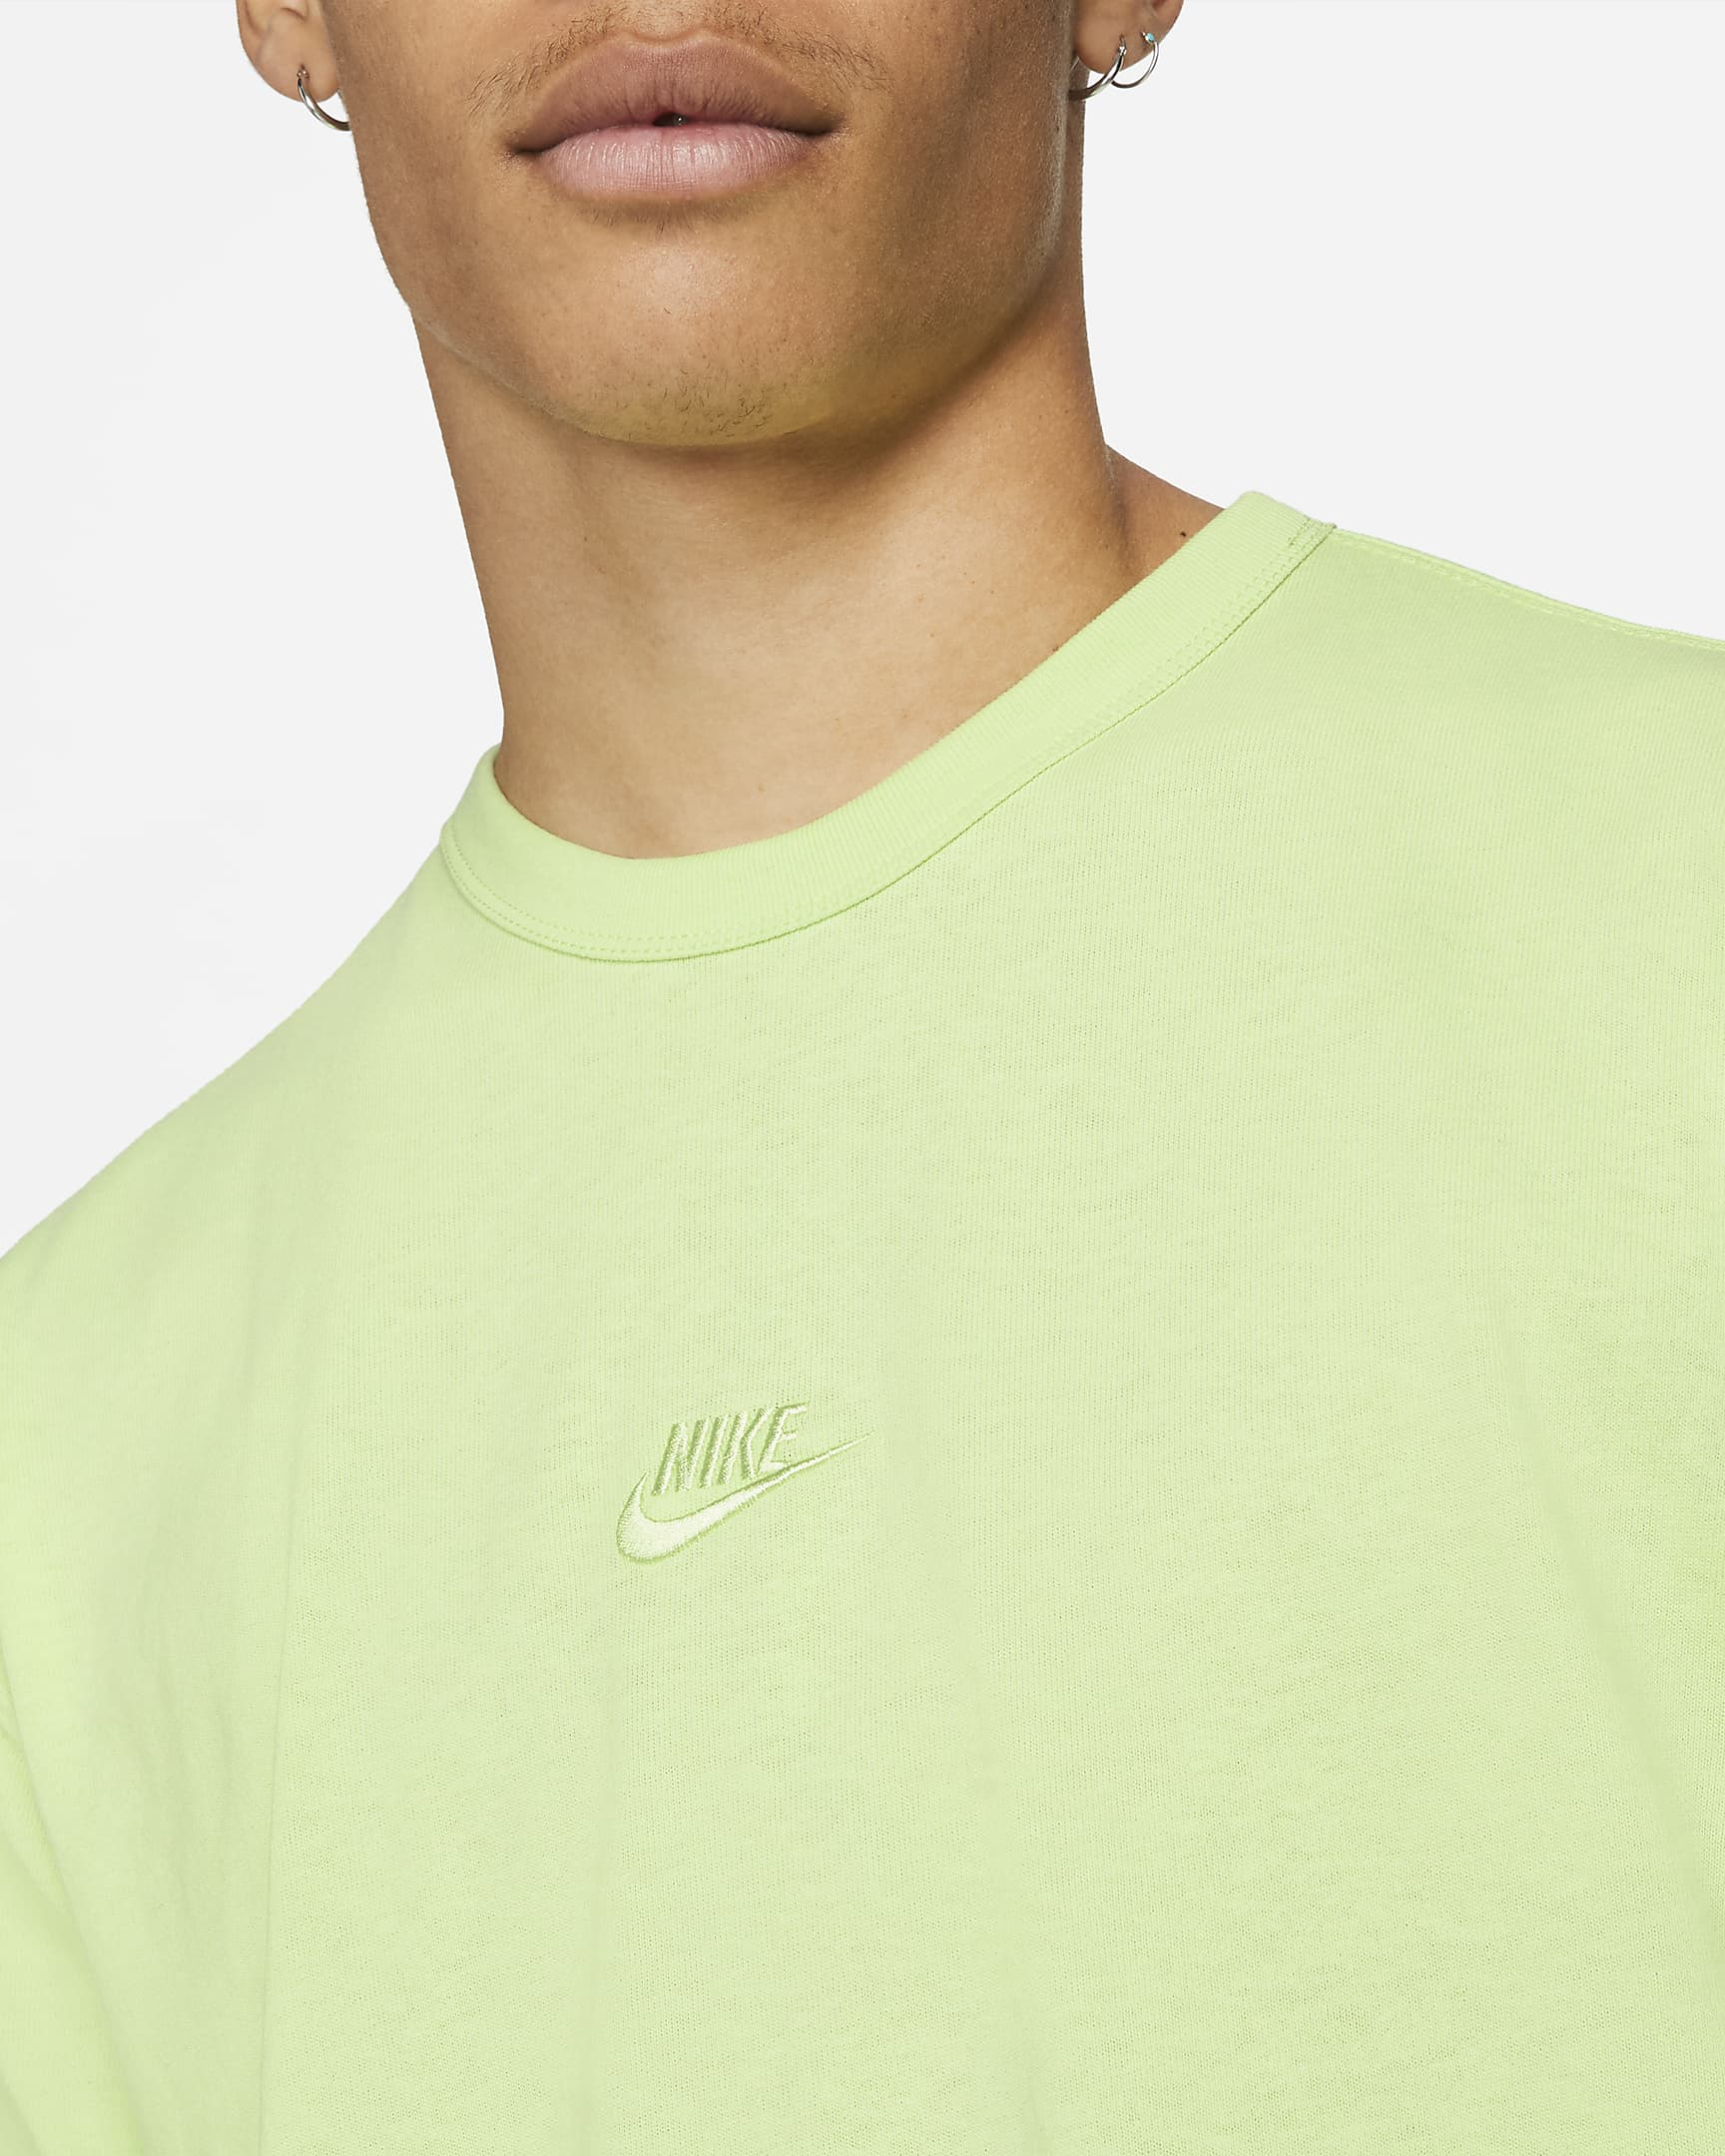 nike-sportswear-premium-essential-mens-t-shirt-SS1mBB-1.png